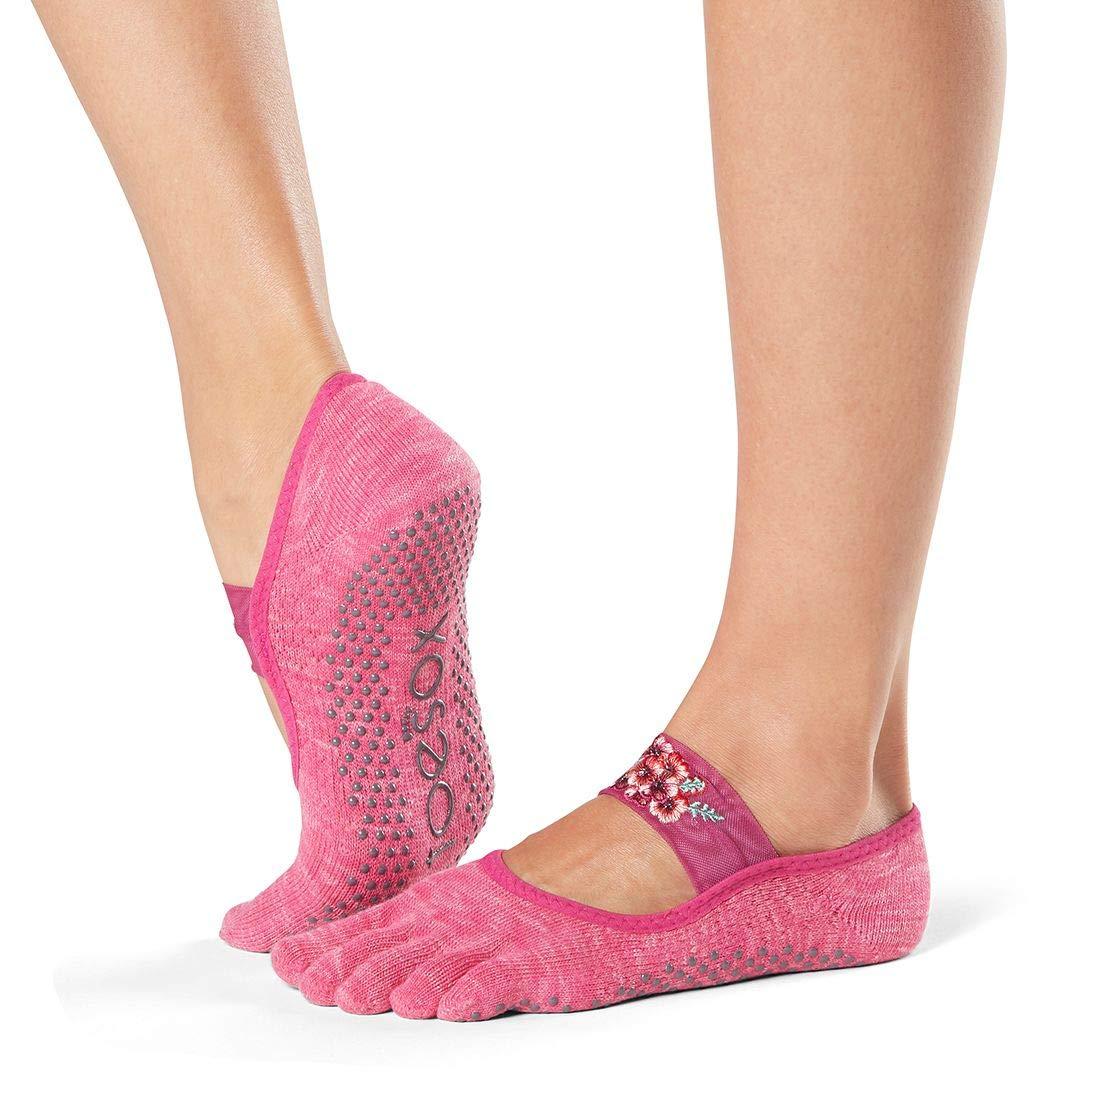 Toesox Grip Pilates Barre Socks-Non-Slip MIA Full Toe For ...